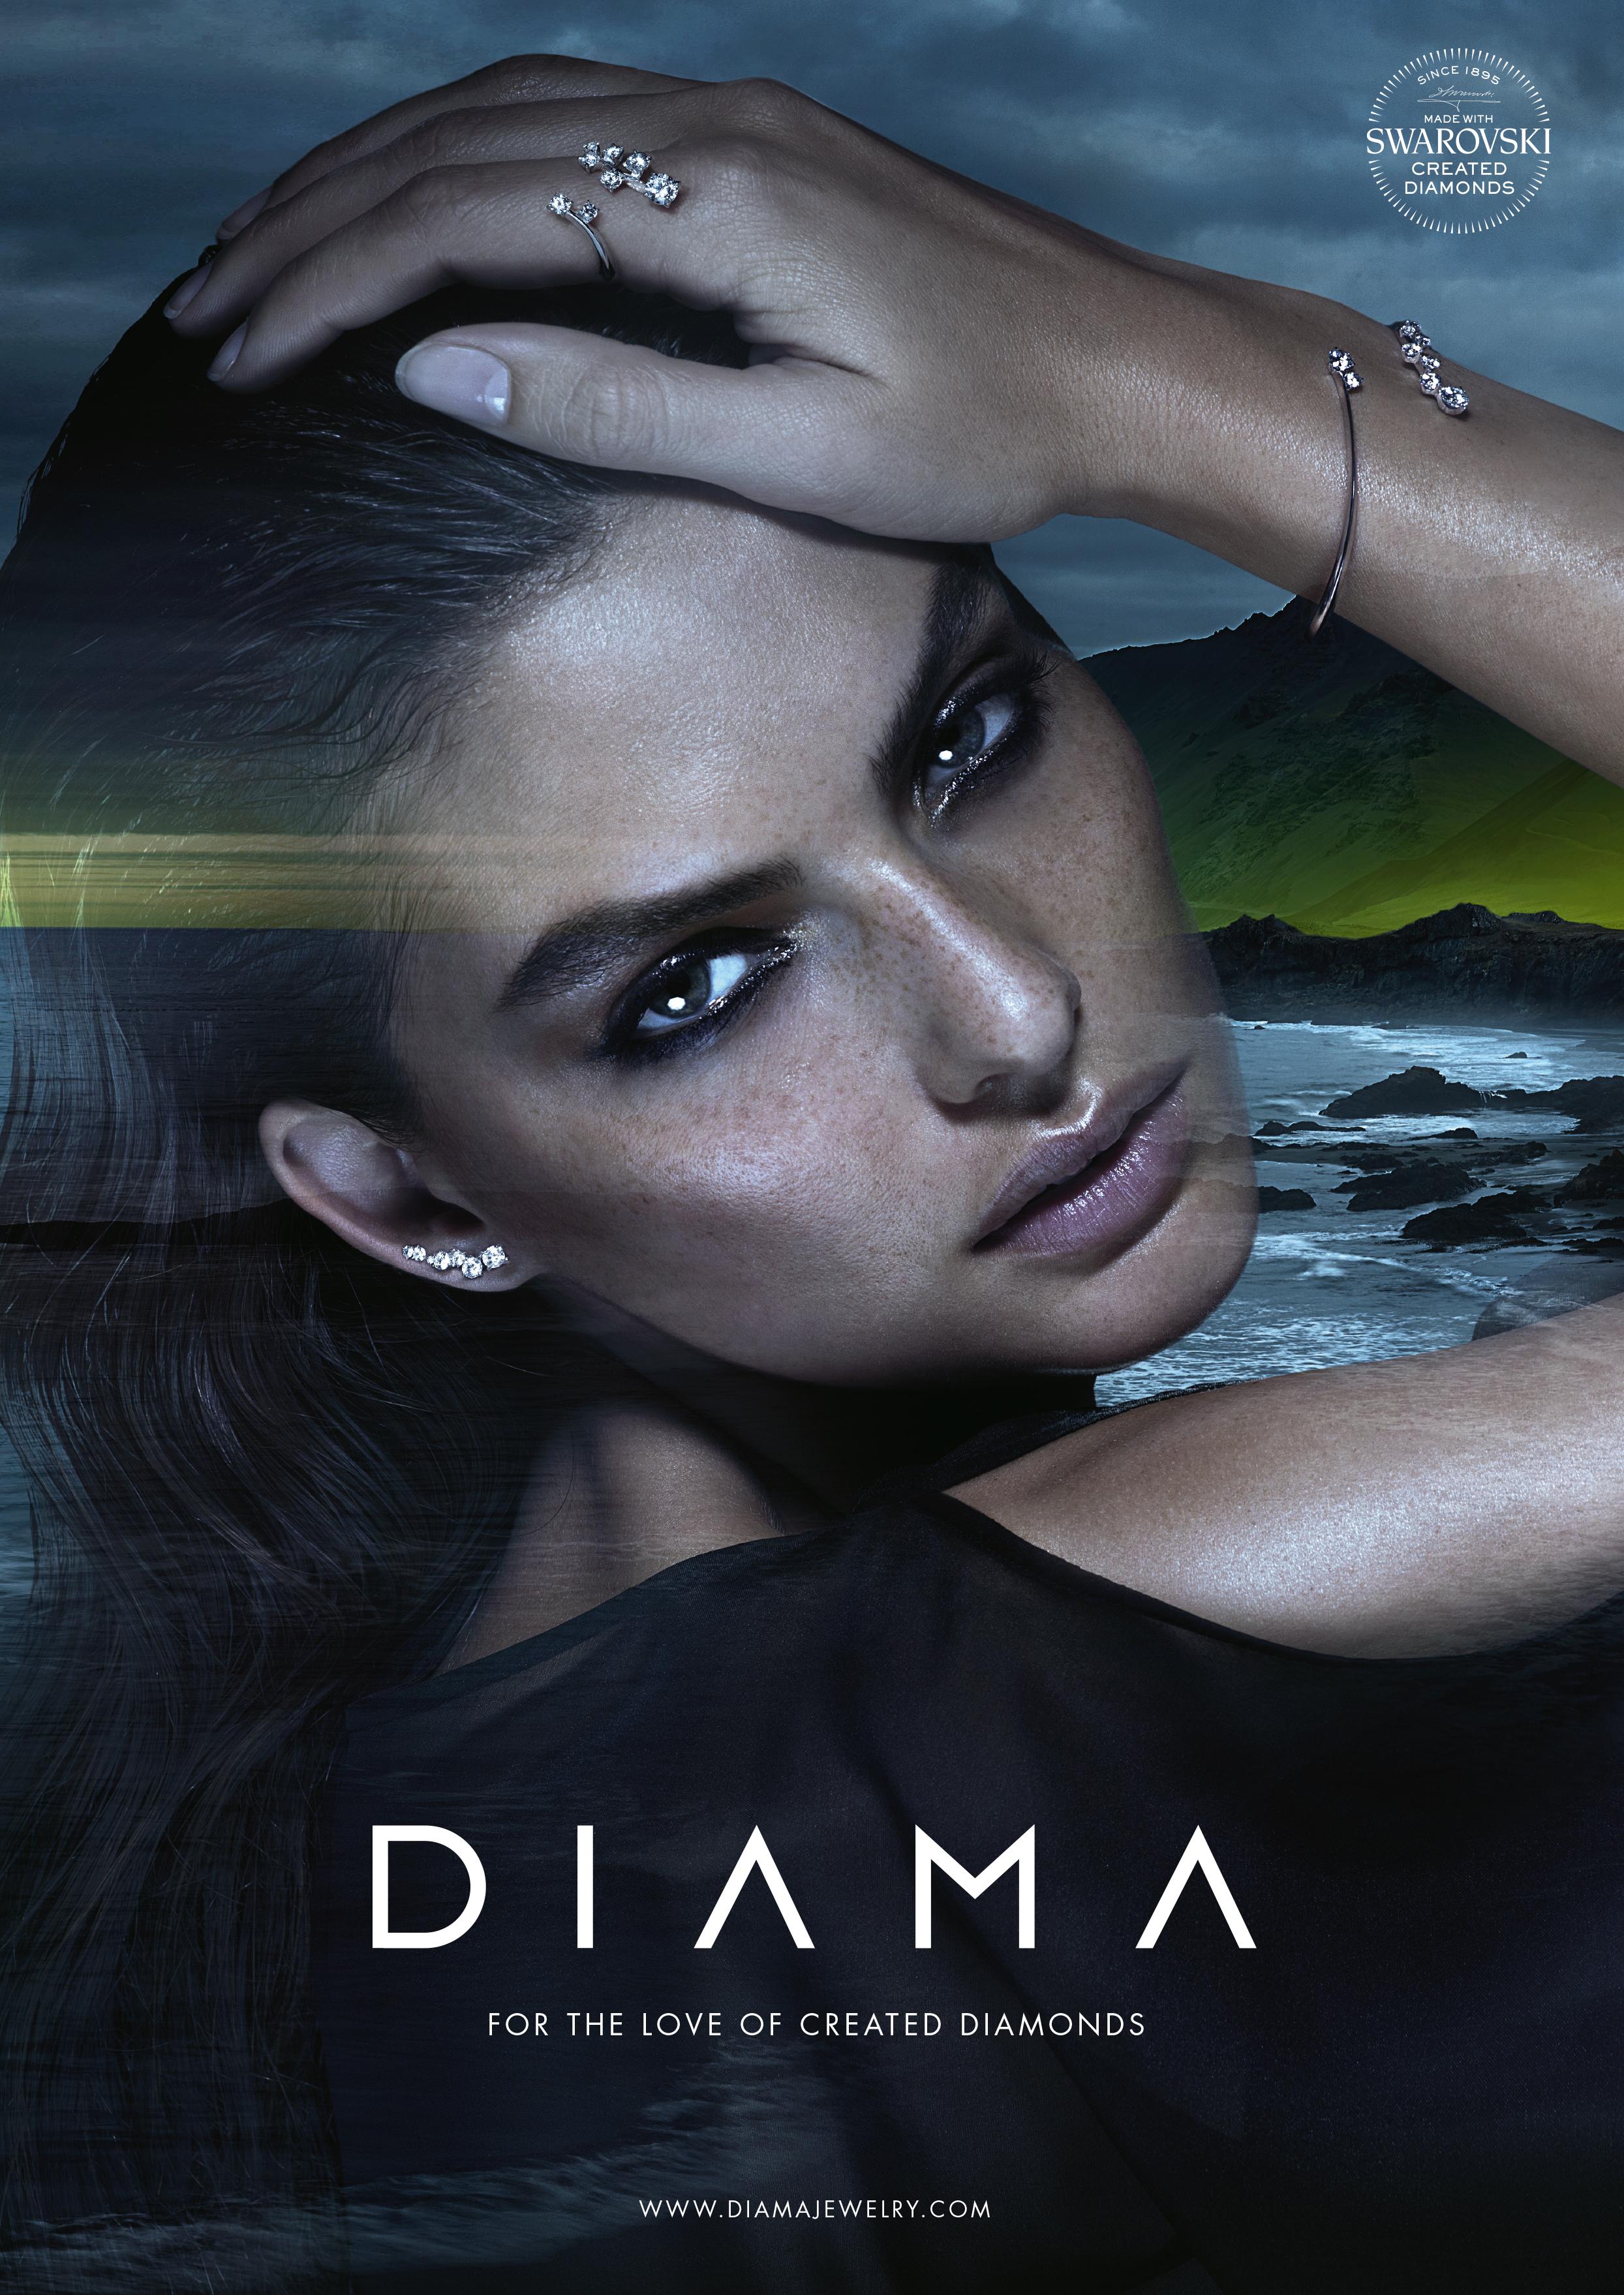 The latest Diama campaign.